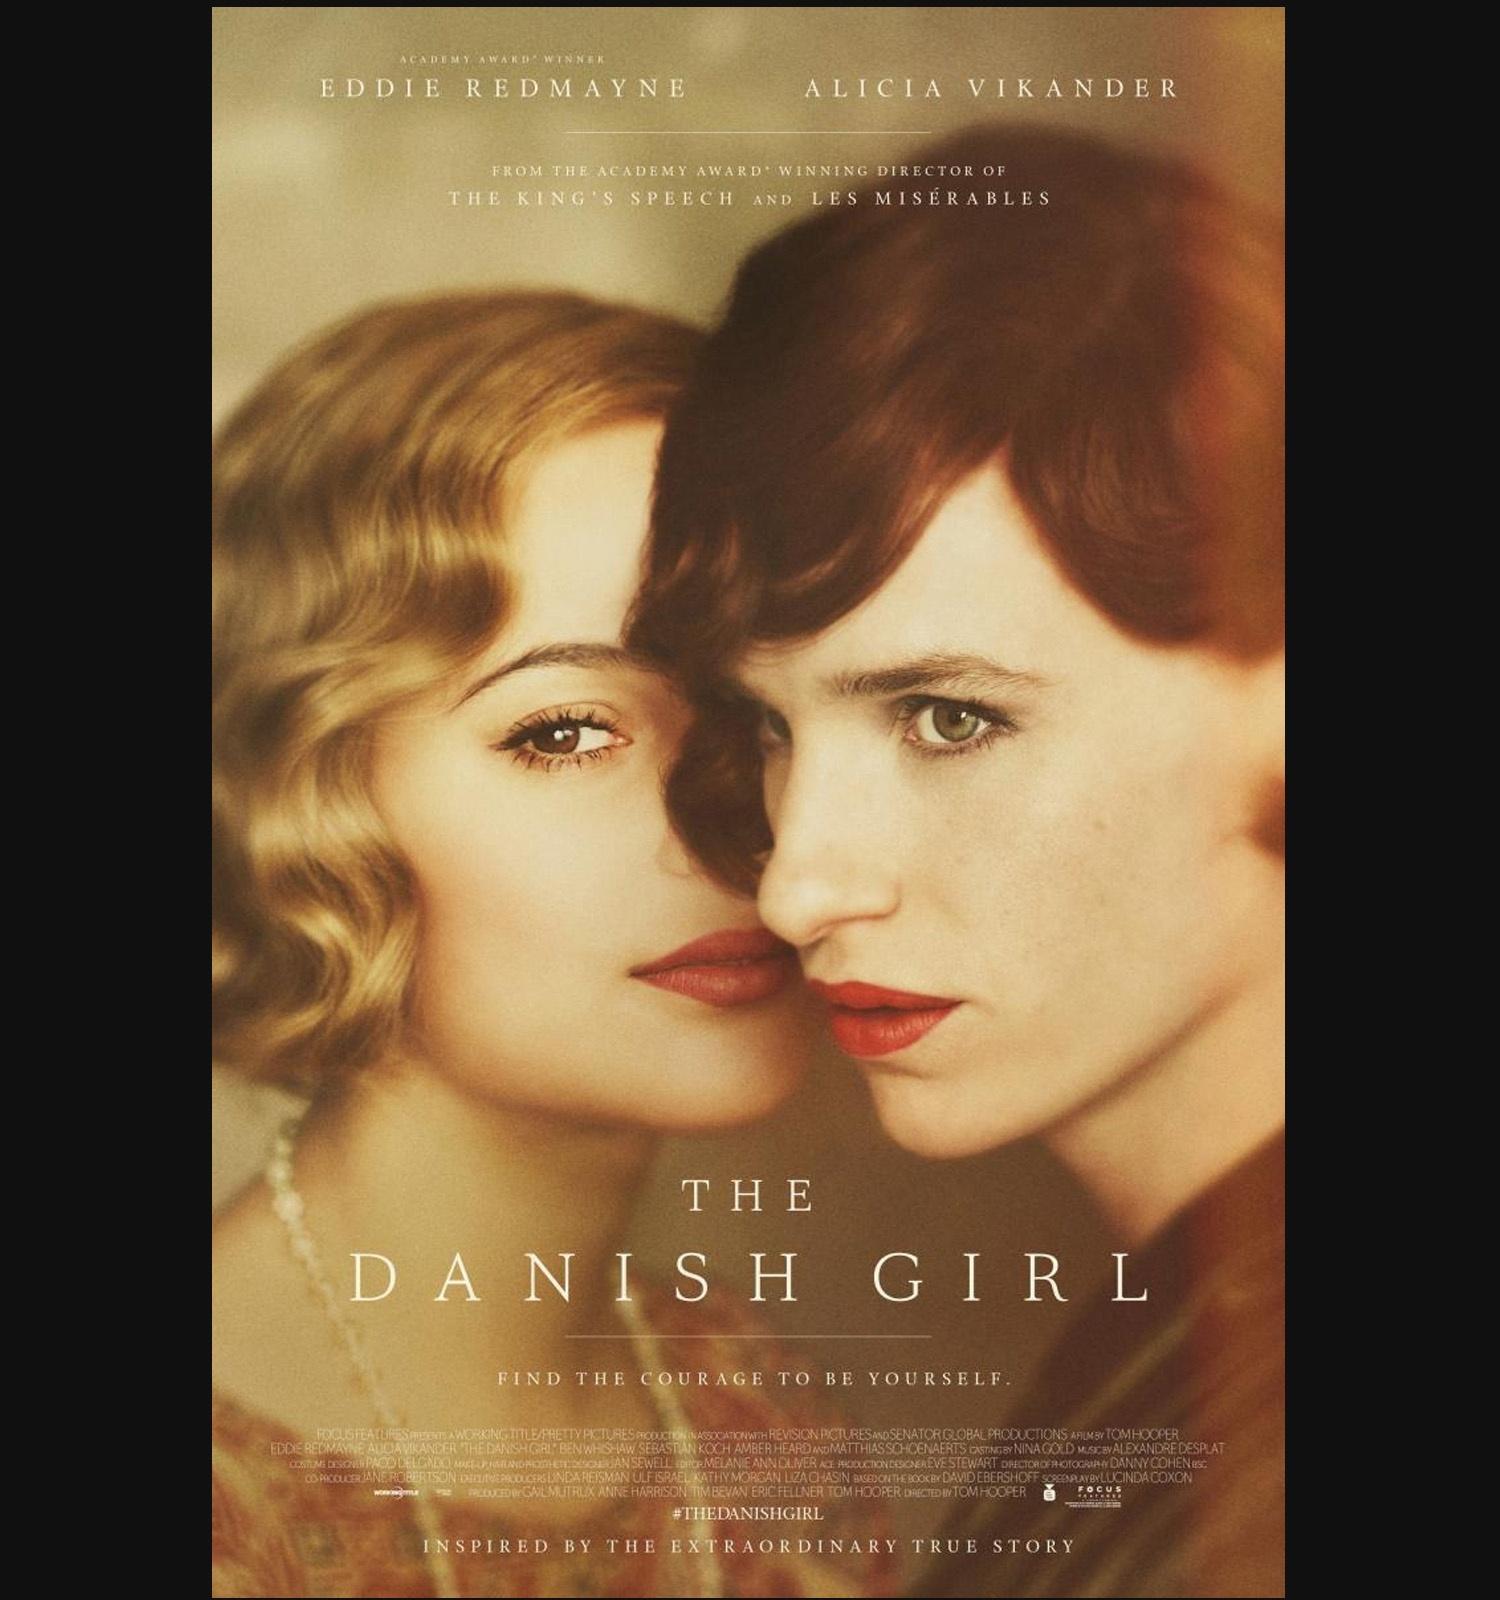 Cartell de la pel·licula The Danish Girl